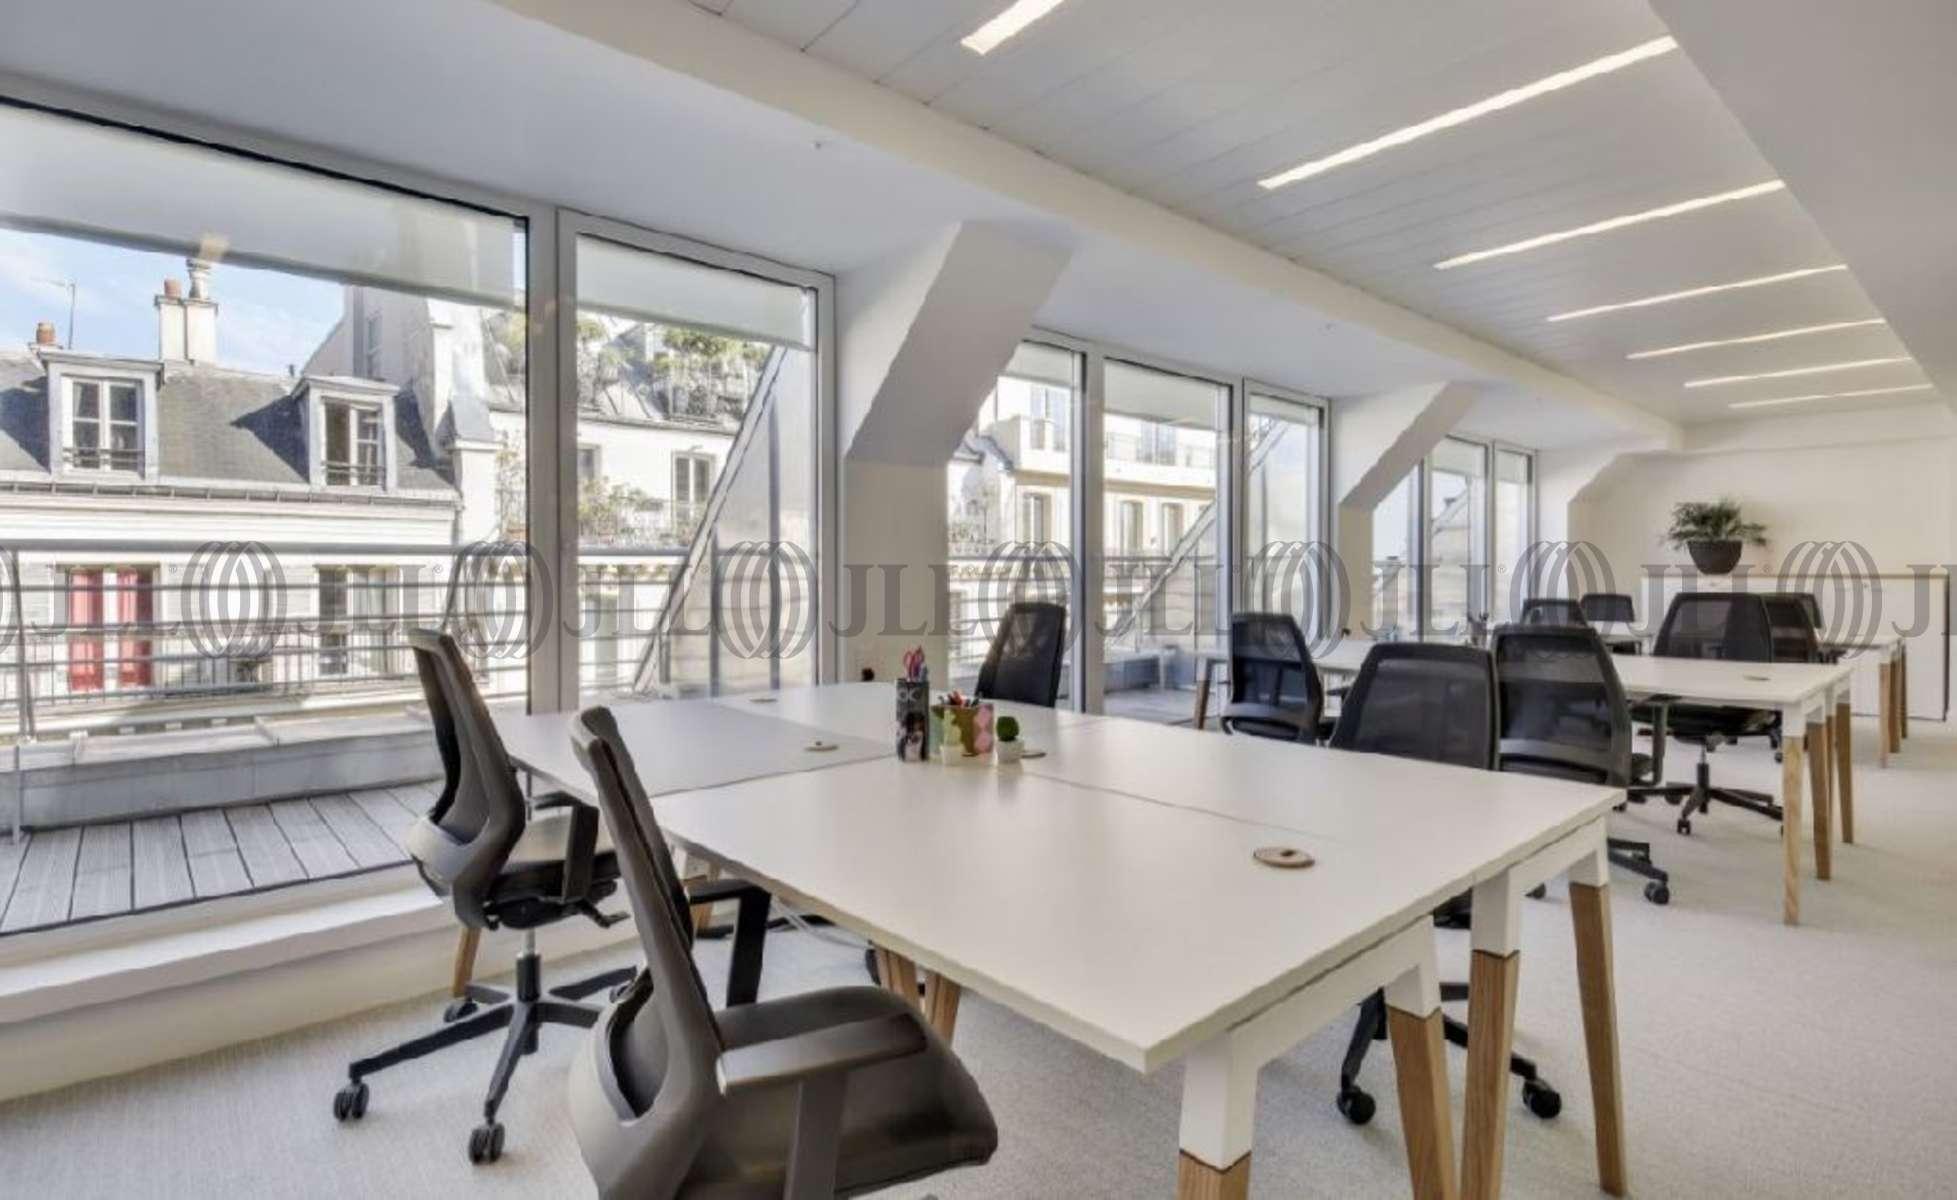 bureaux louer nextdoor champs elysees 75008 paris 58577 jll. Black Bedroom Furniture Sets. Home Design Ideas